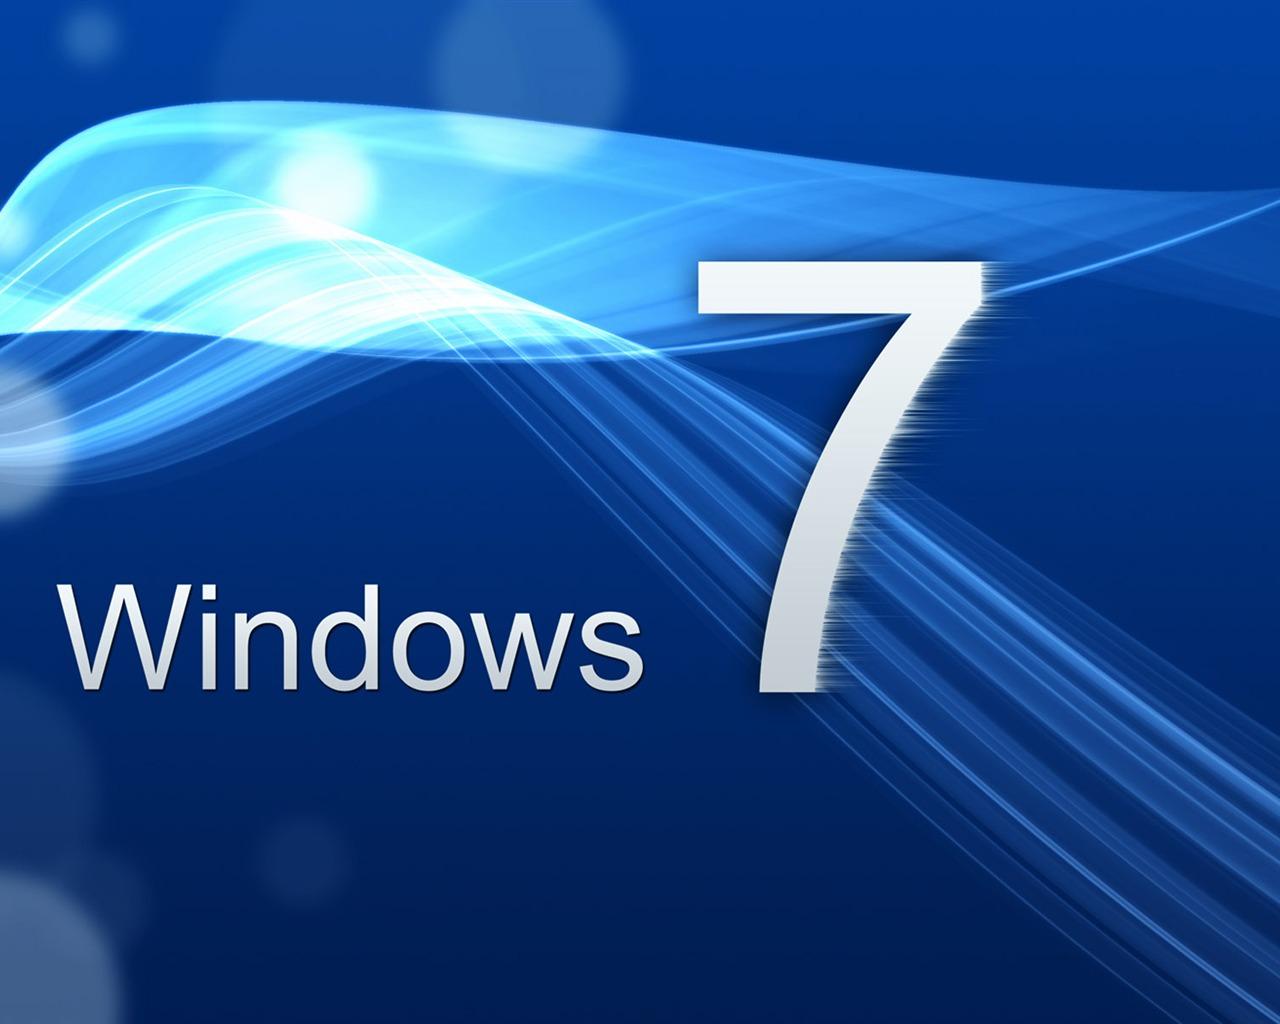 12 Images For   Windows 7 Desktop Wallpaper Download 1280x1024